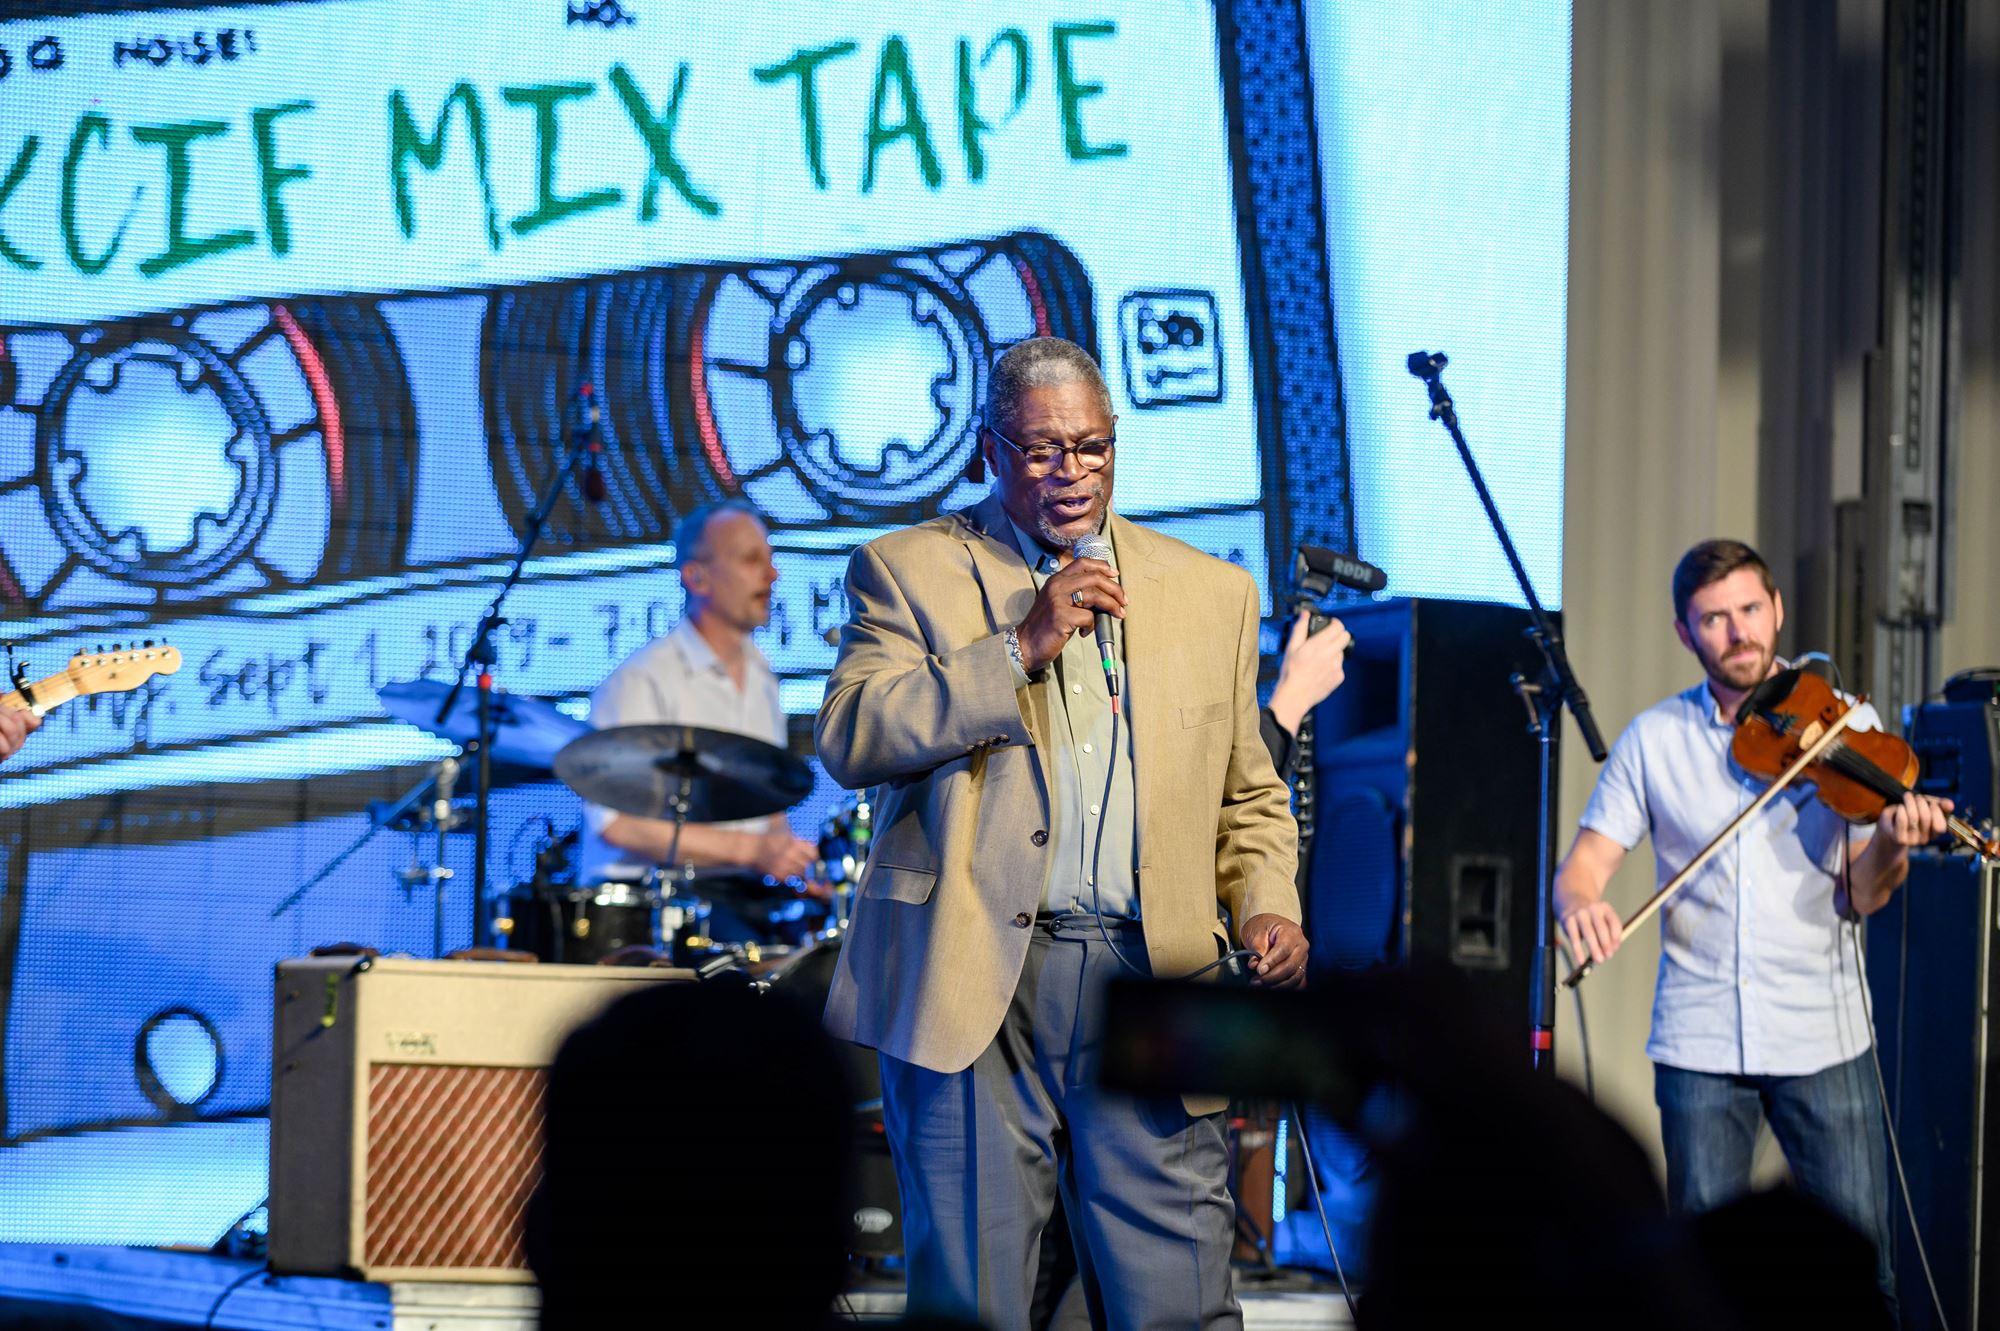 KCIF Mix Tape